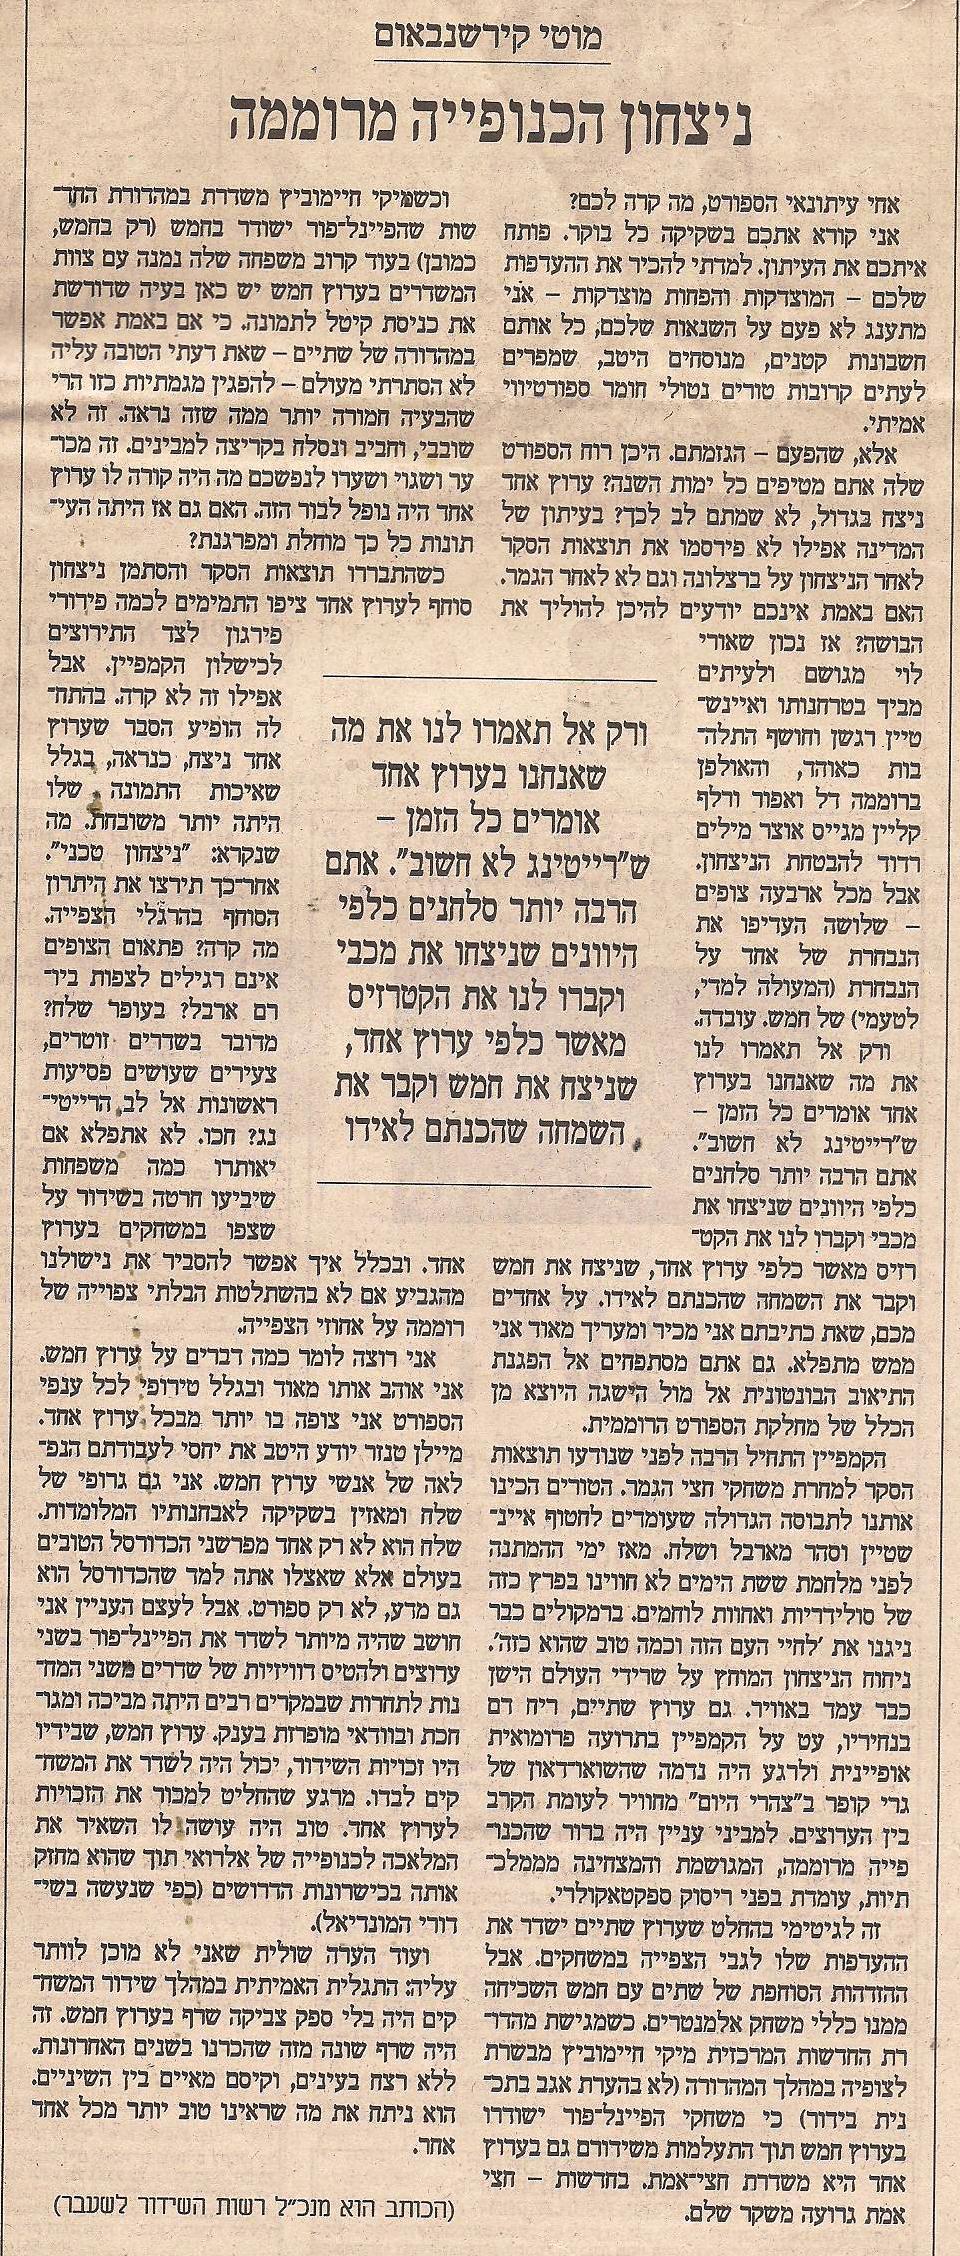 yoash kirshenbaum 1